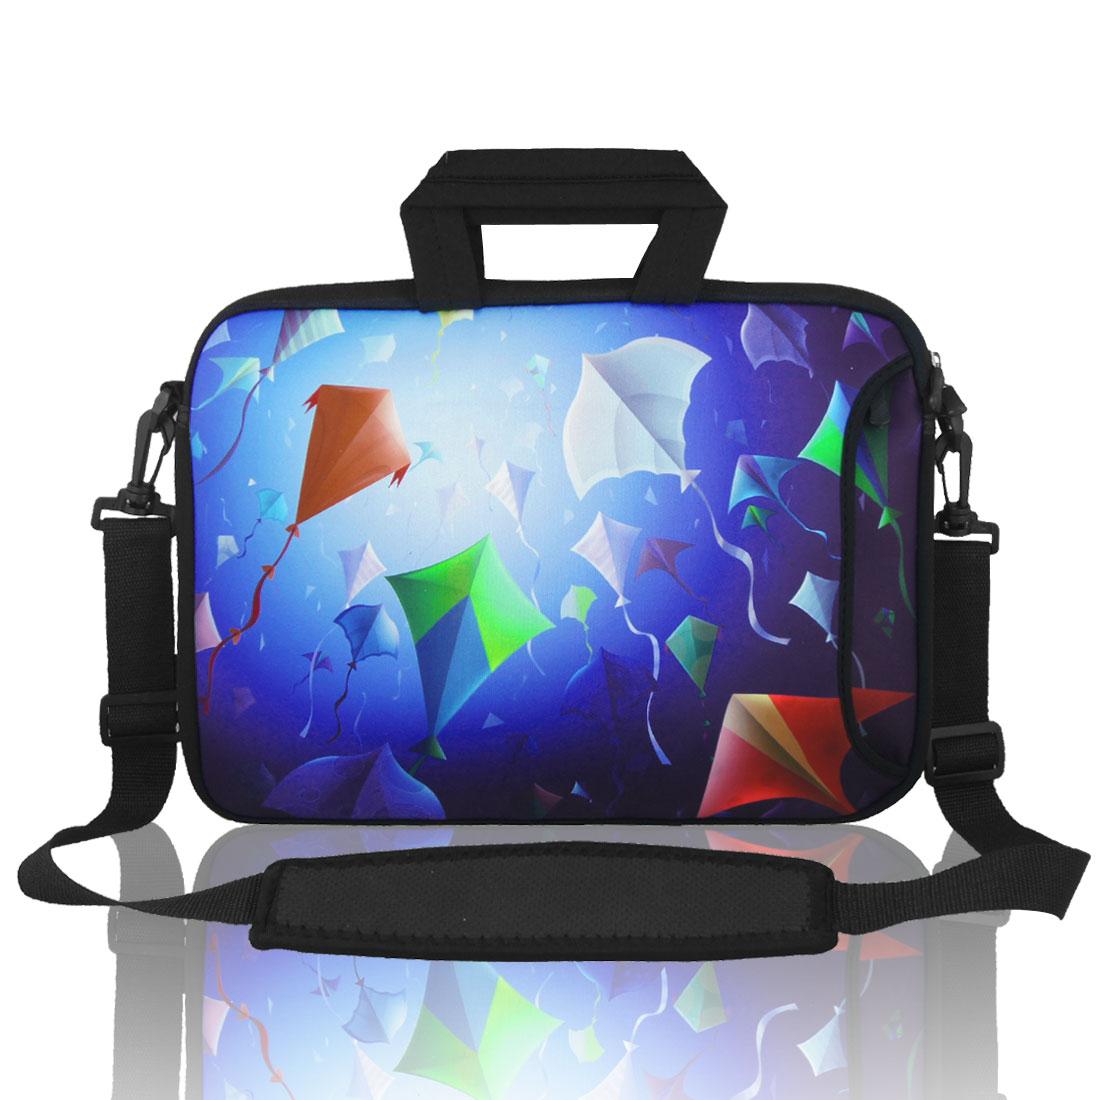 "17"" 17.3"" 17.4"" Kite Pattern Laptop Sleeve Bag Case w Shoulder Strap for PC Laptop"